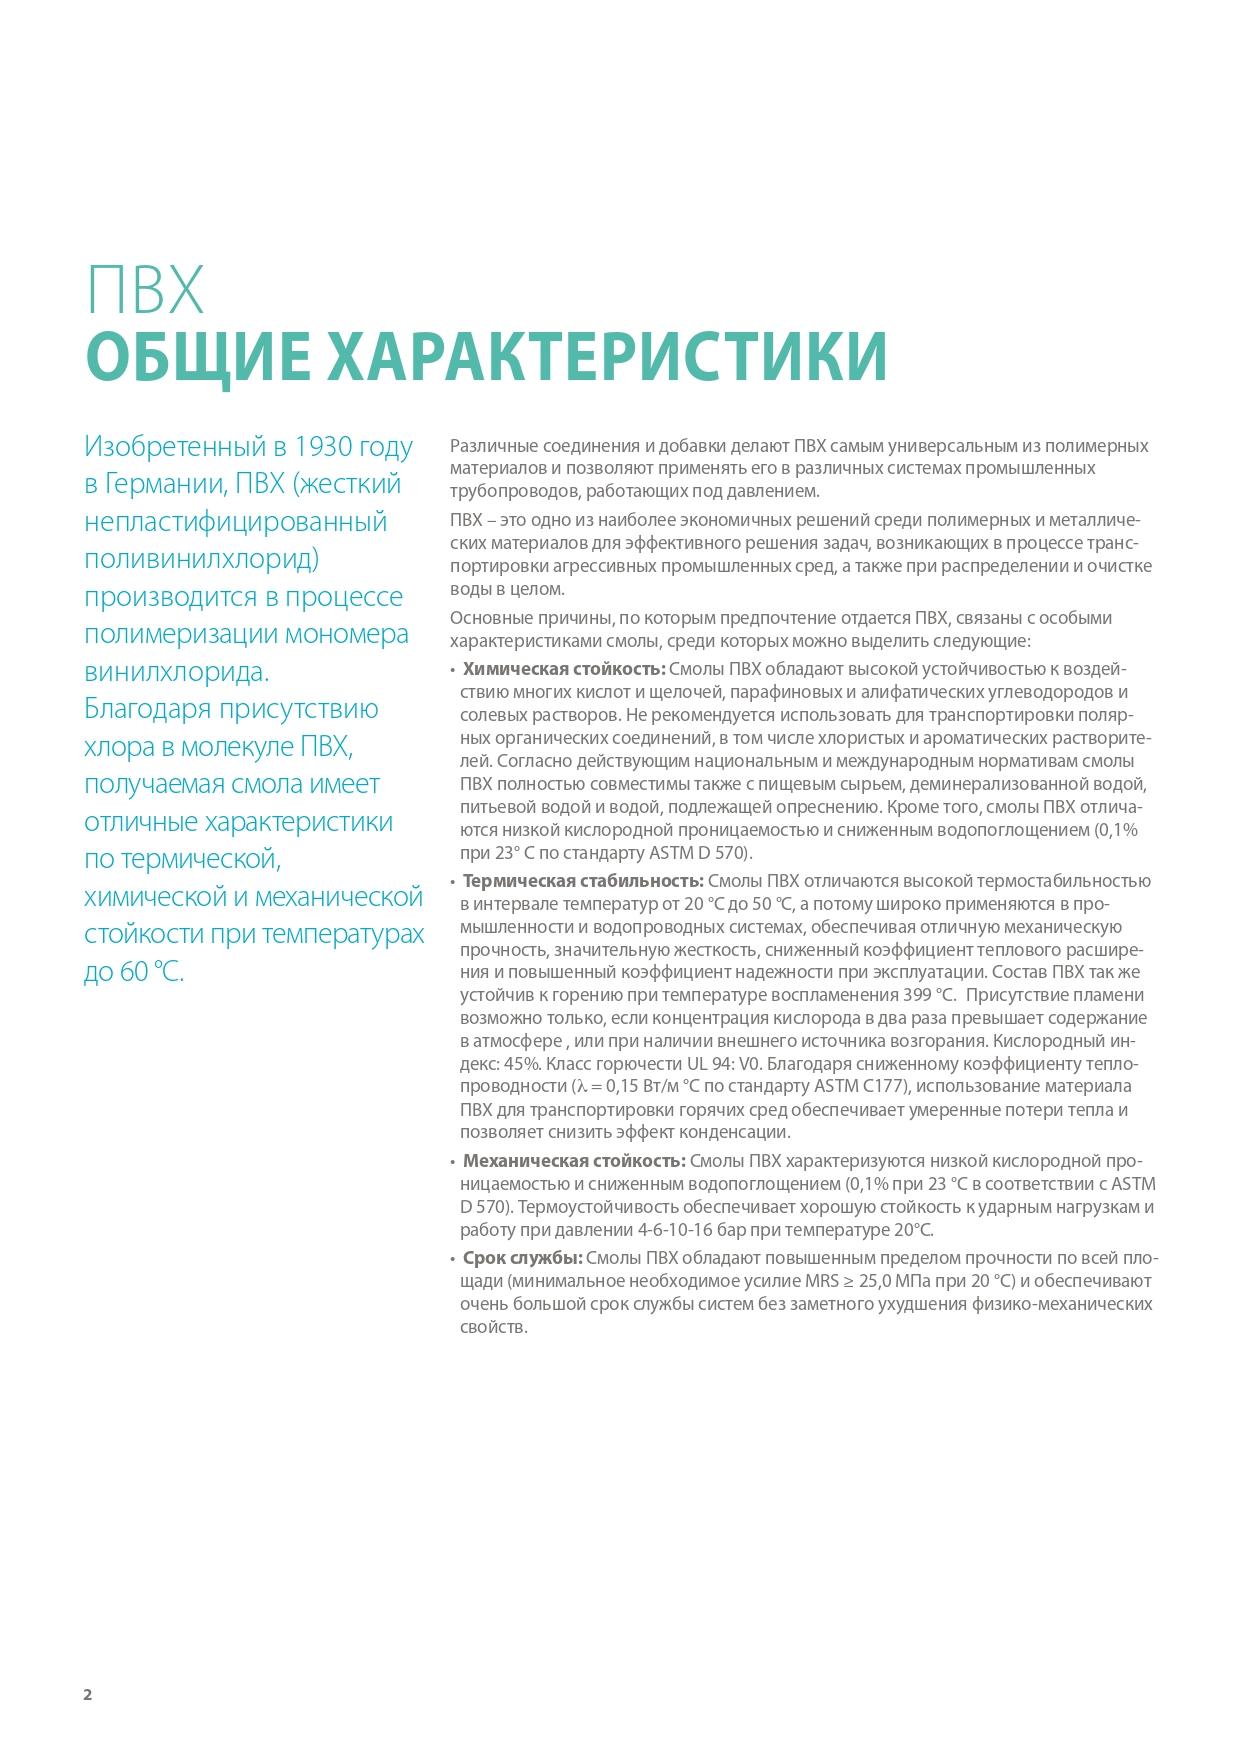 Общие характеристики ПВХ